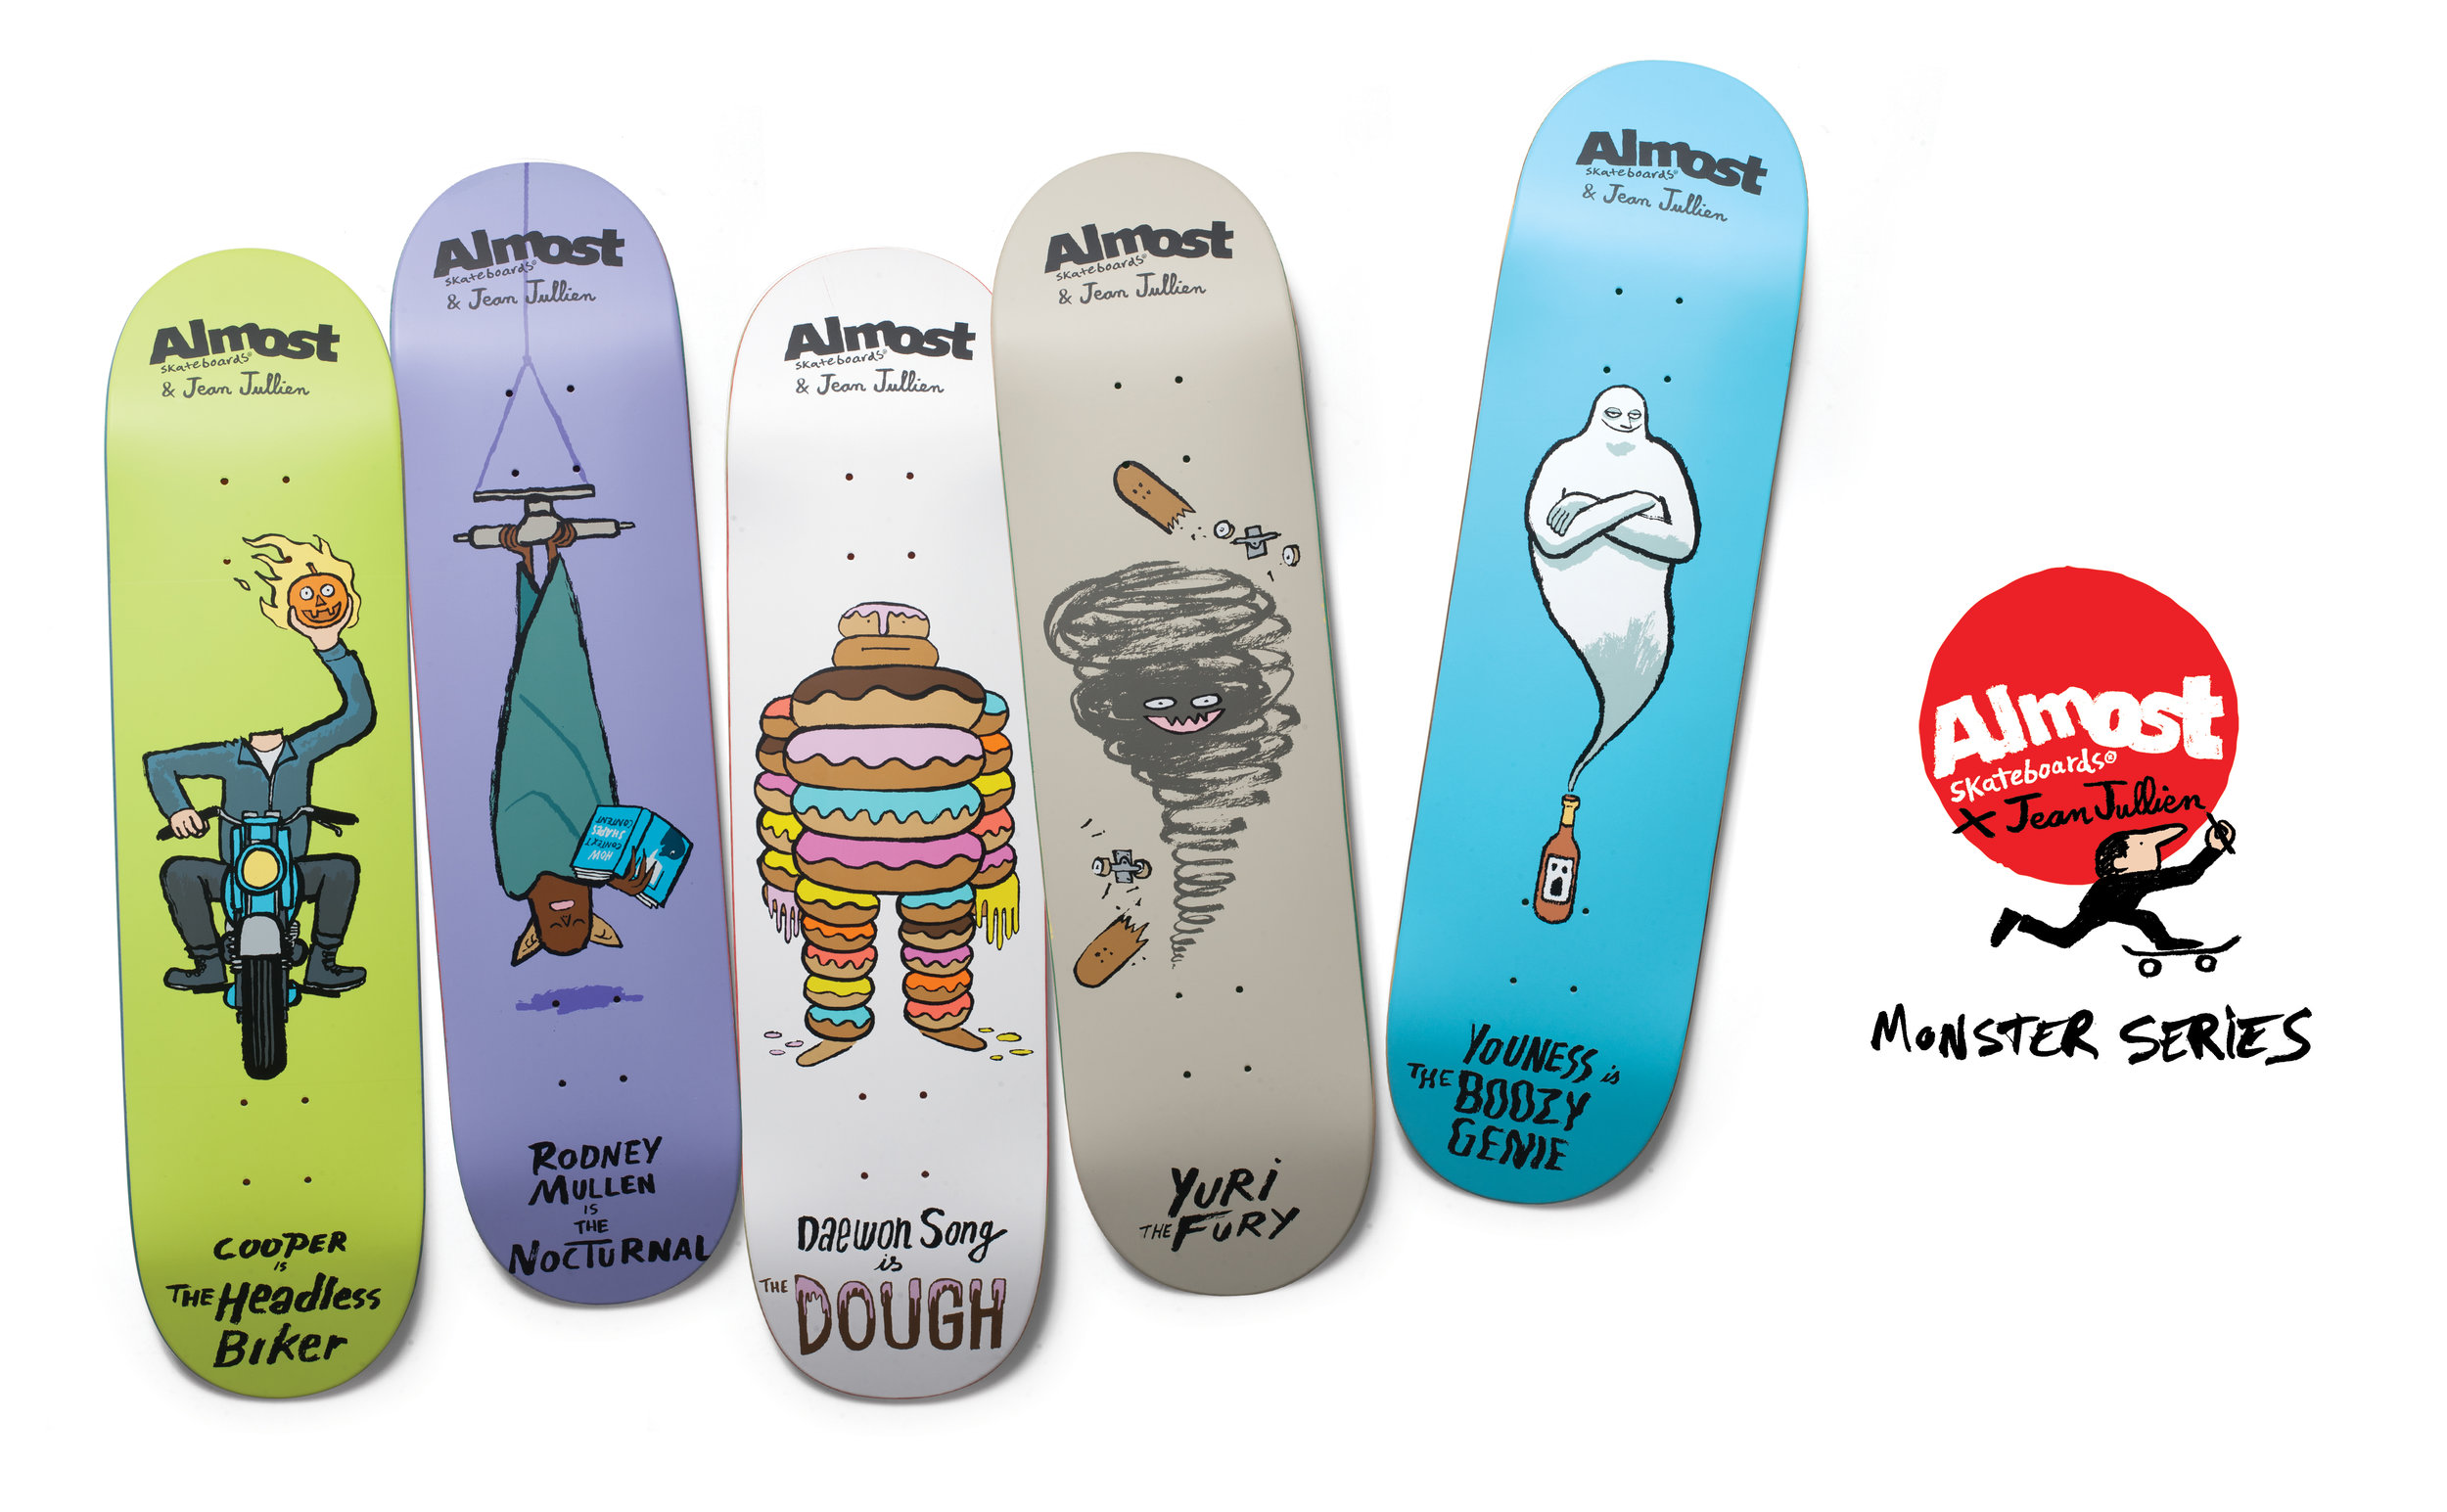 Almost_Skateboards_x_Jean_Jullien_Moster_Series_layout.jpg